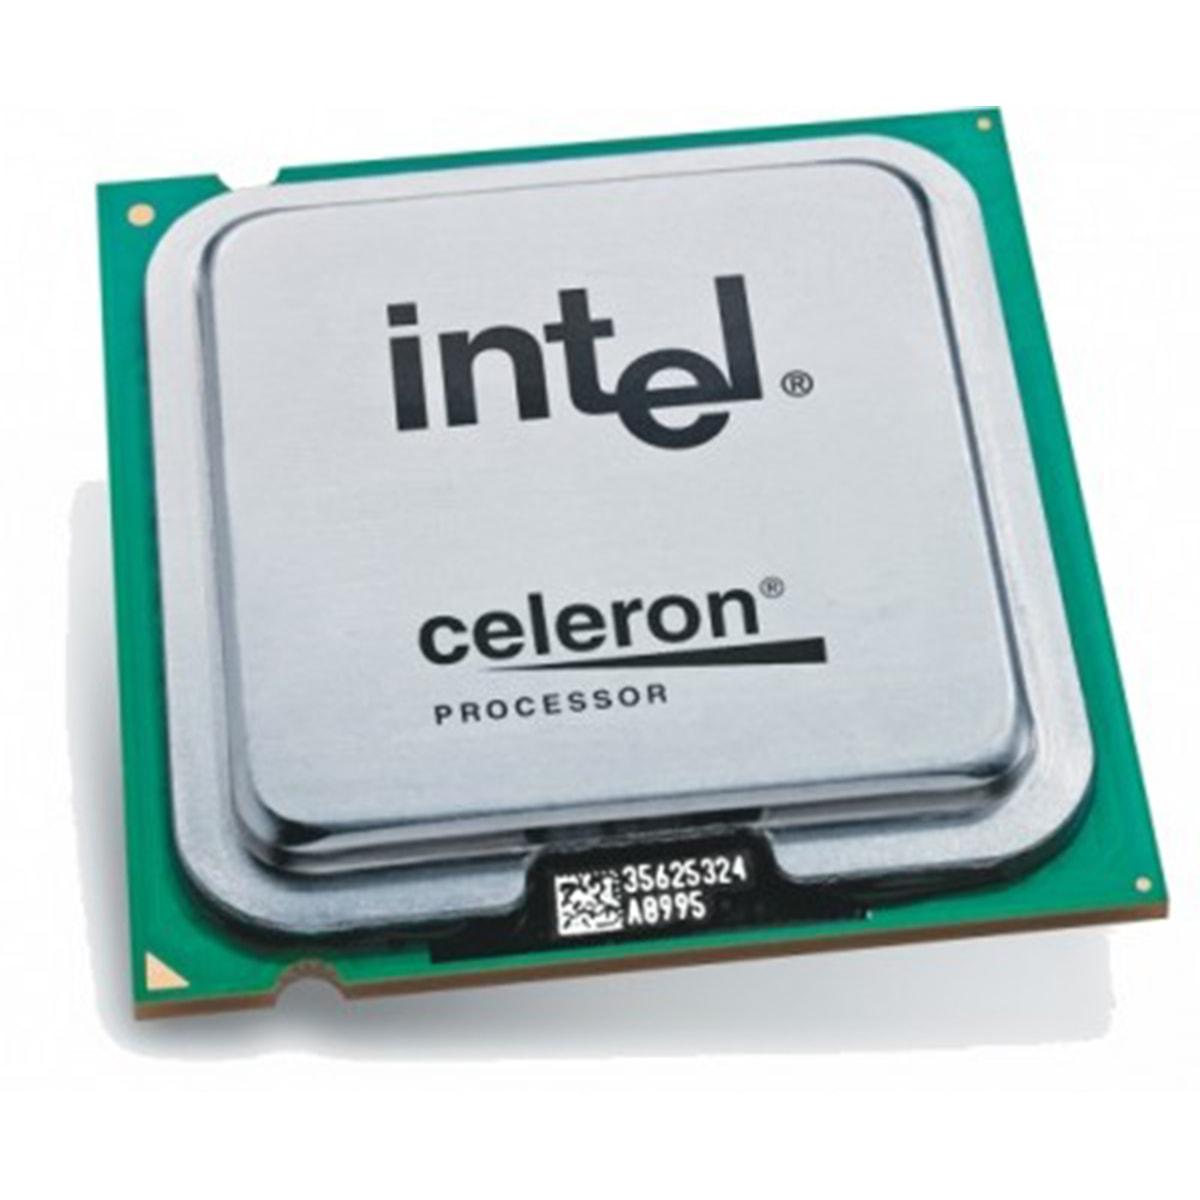 Processador Intel Celeron 420 1,60Ghz 512Kb Cache 800MHz - Socket 775 - Seminovo